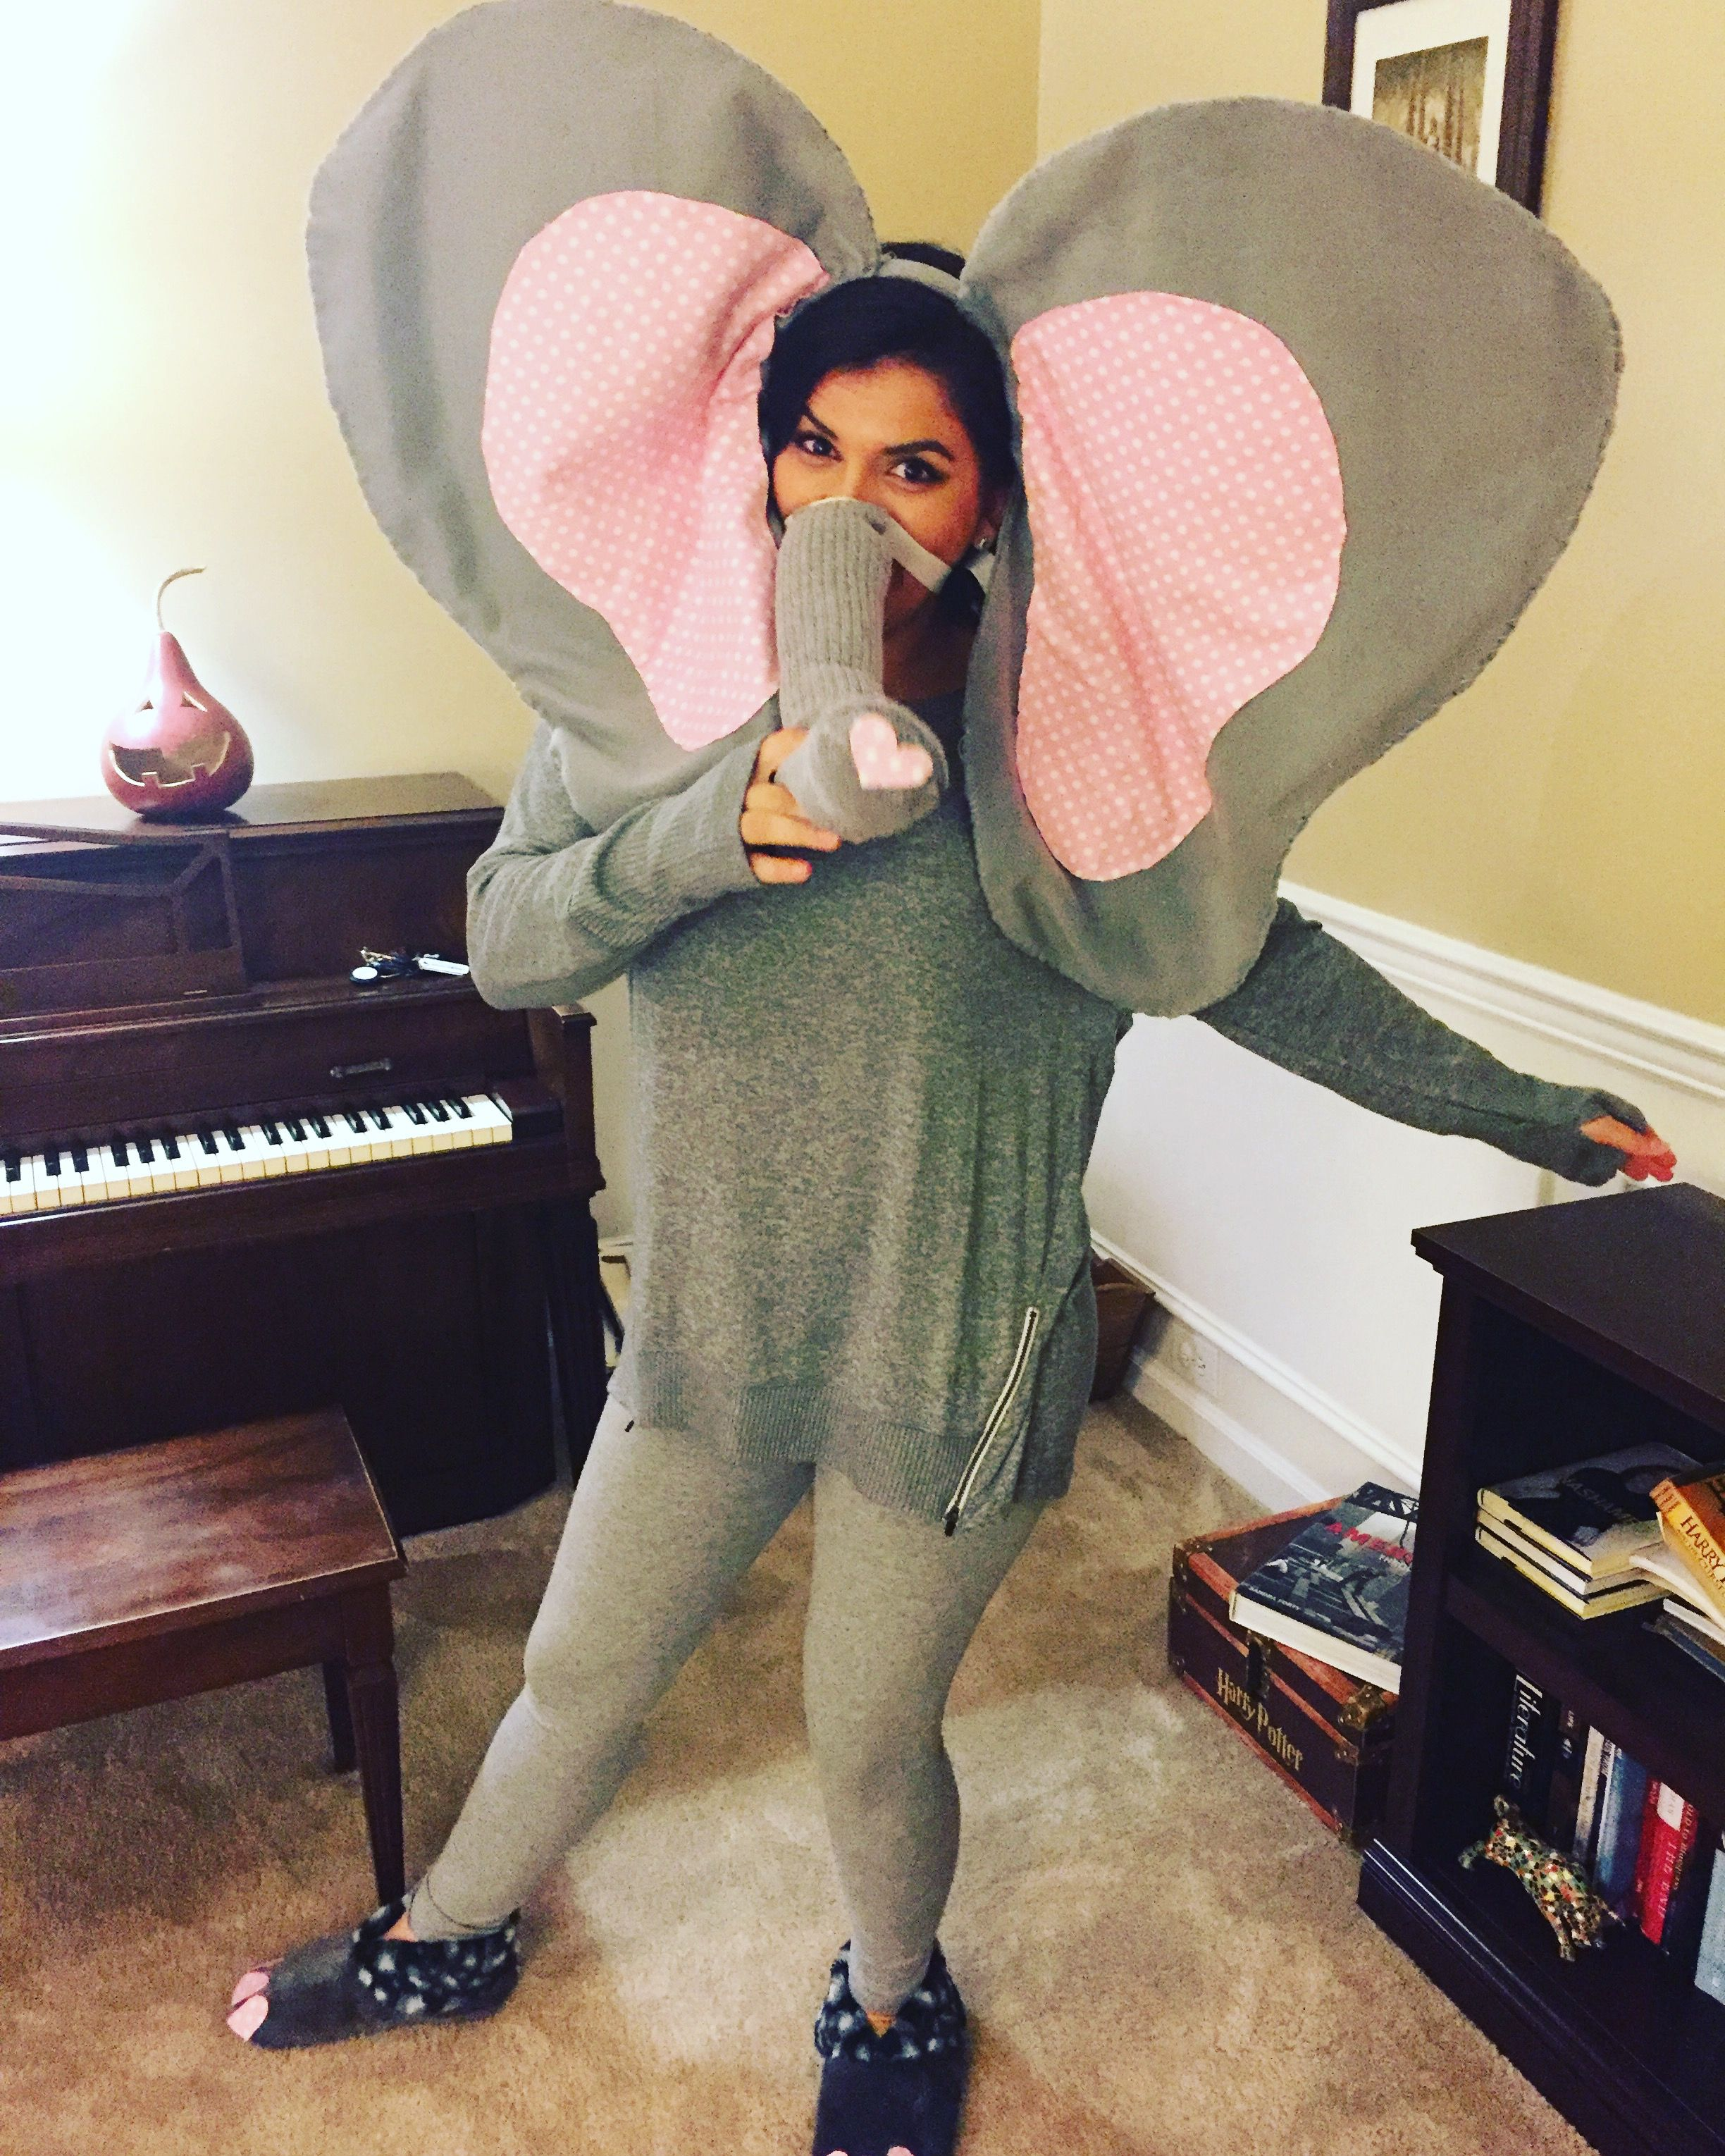 DIY Elephant Costume #diy #elephant #costume #elephantcostume #halloween #homemadecostume # & DIY Elephant Costume #diy #elephant #costume #elephantcostume ...